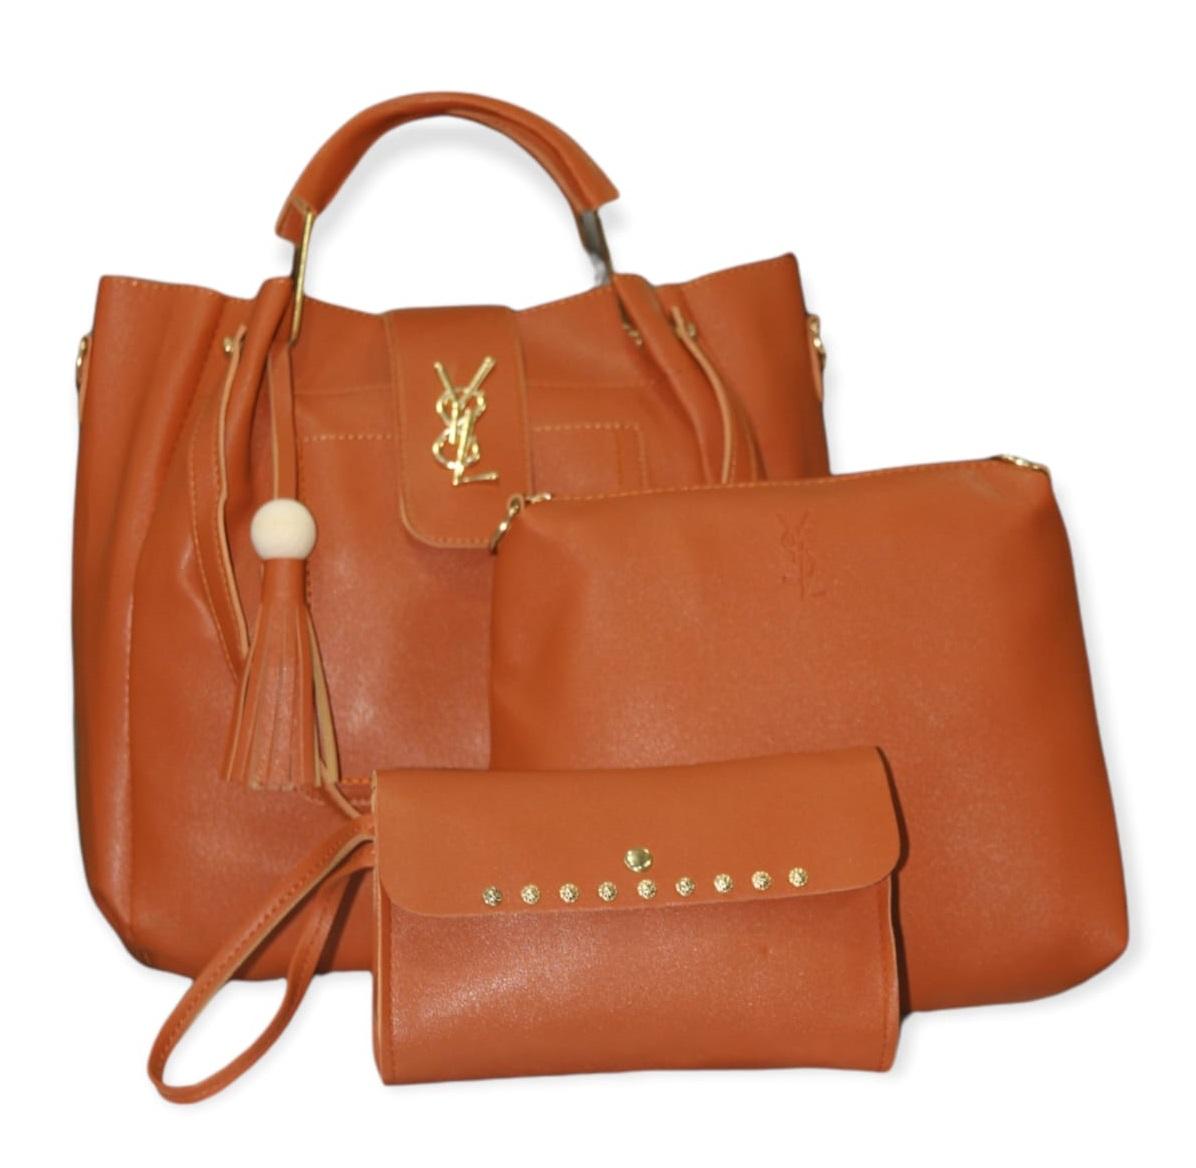 3 in 1 Handbags for Girls, Women, Ladies, Tote Bag, Purse and Shoulder Bag